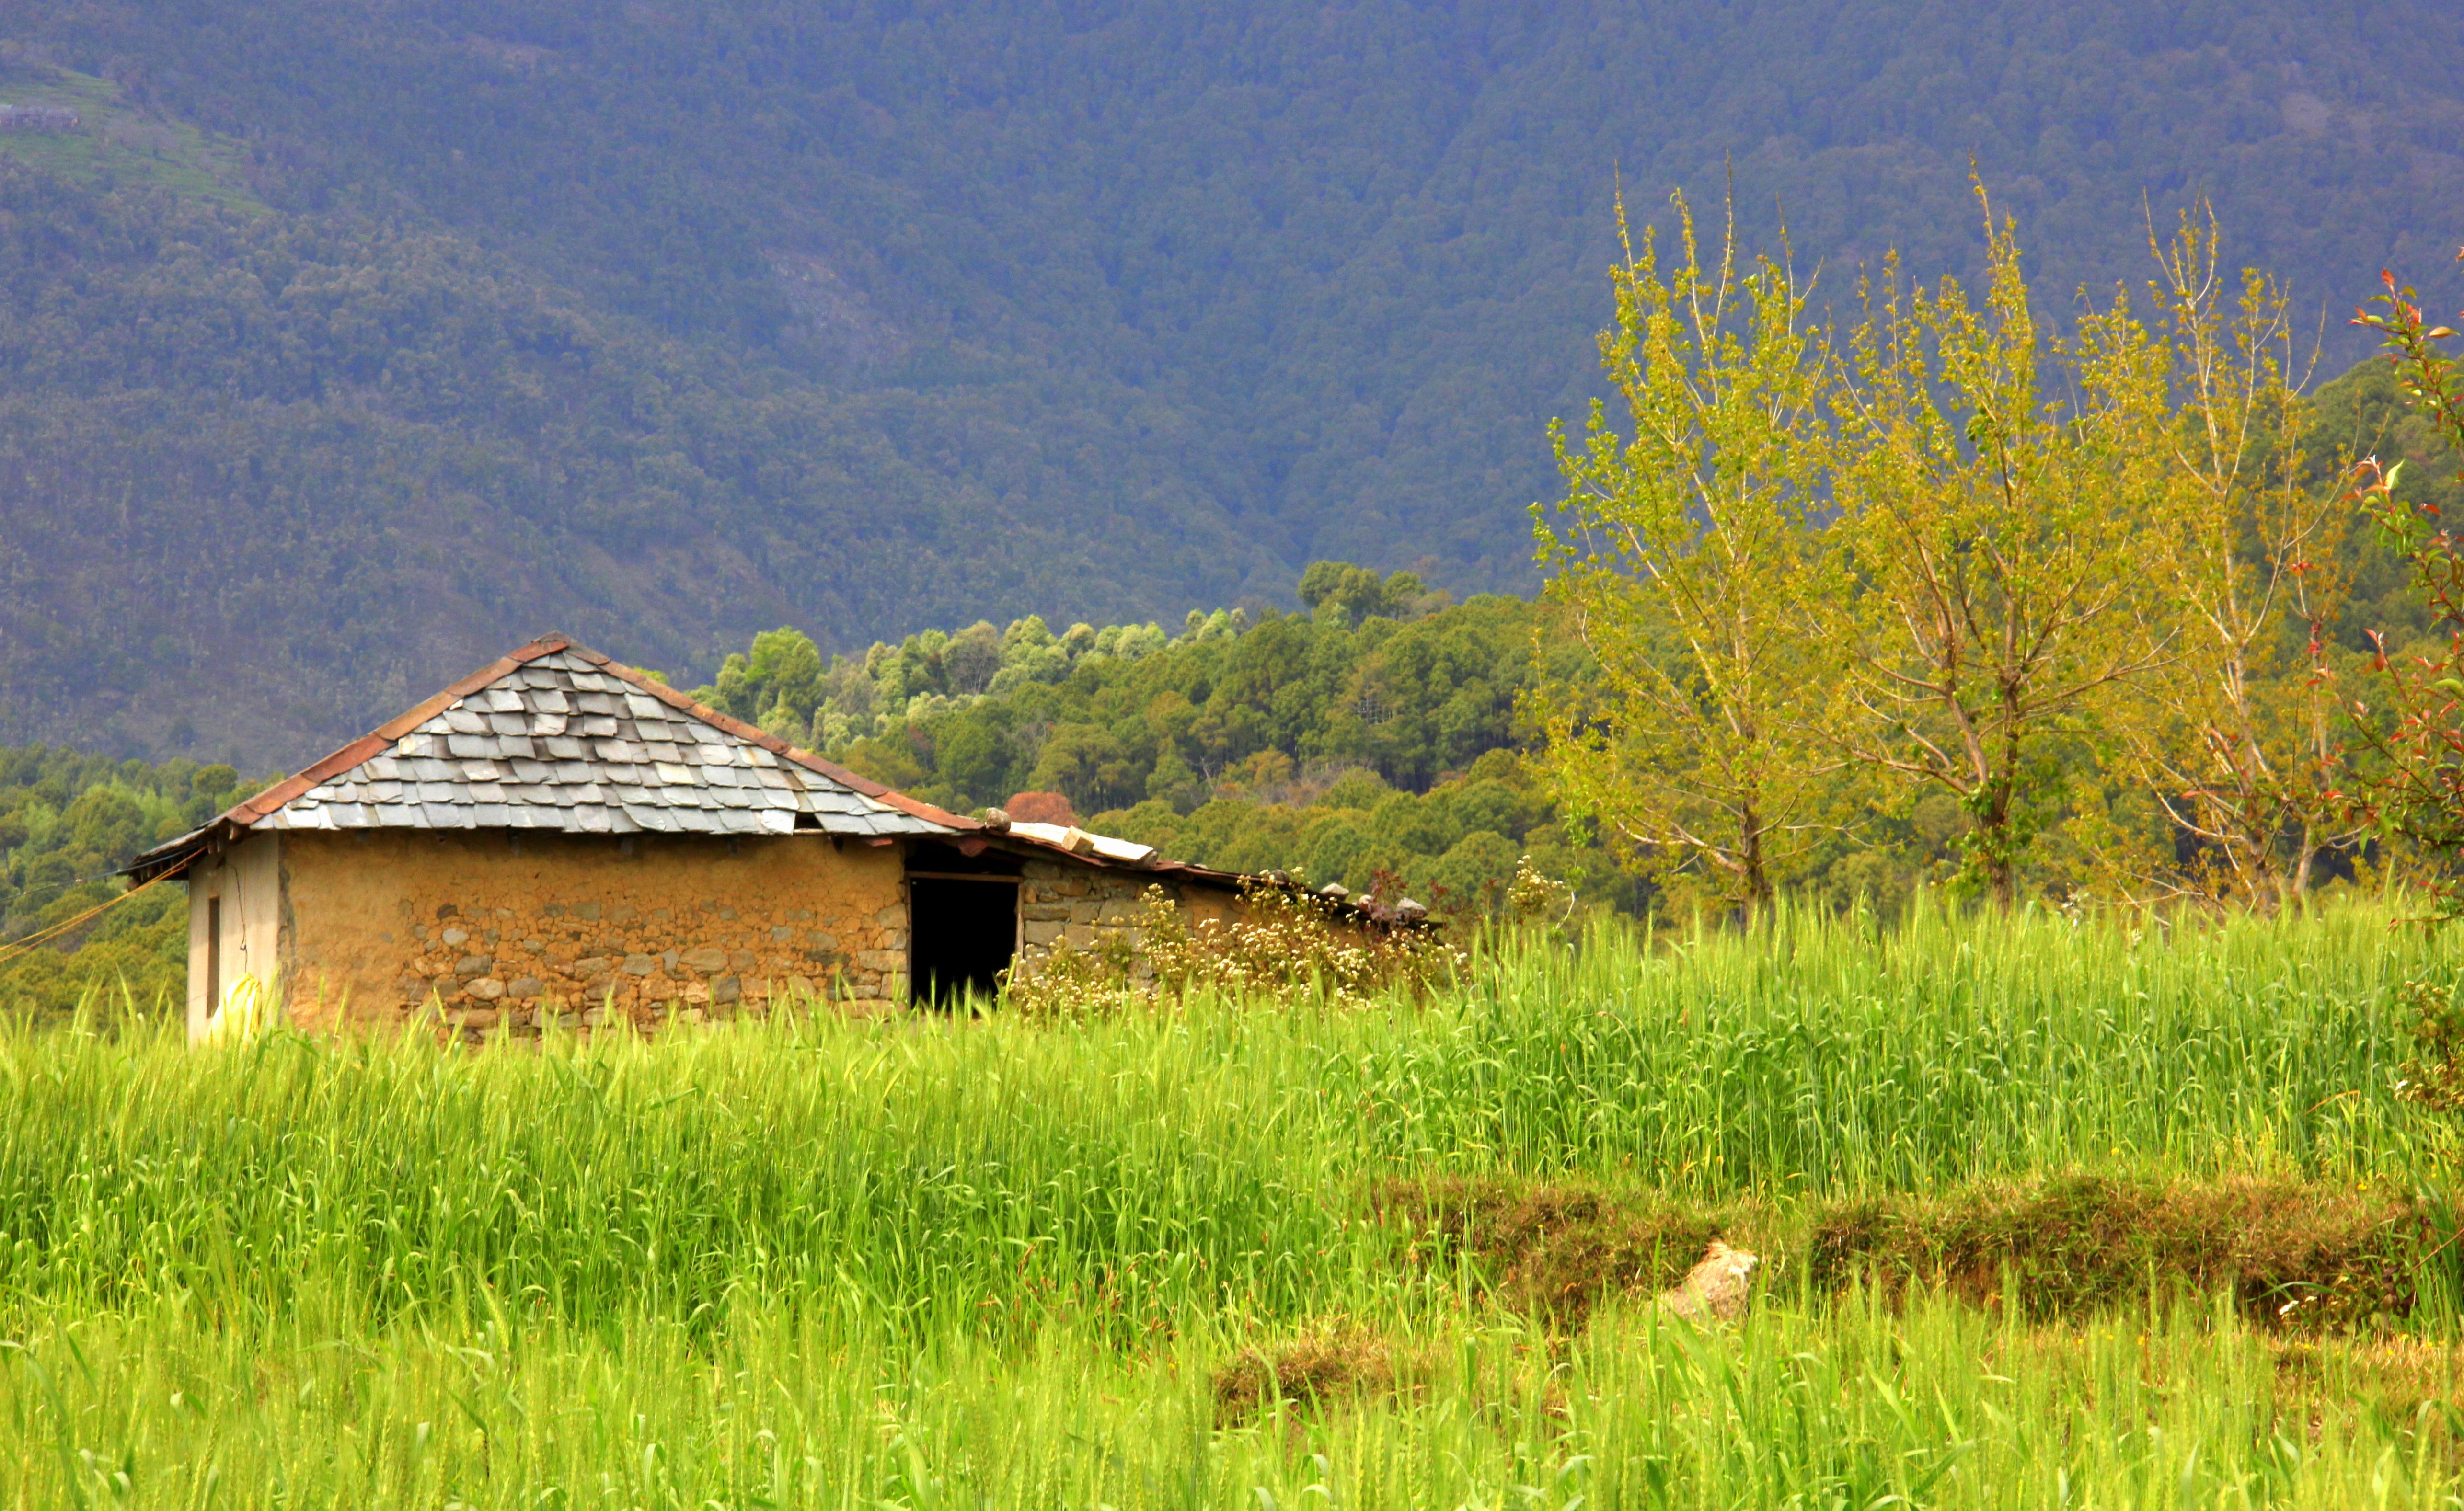 #India #Himachalpradesh #travelblog